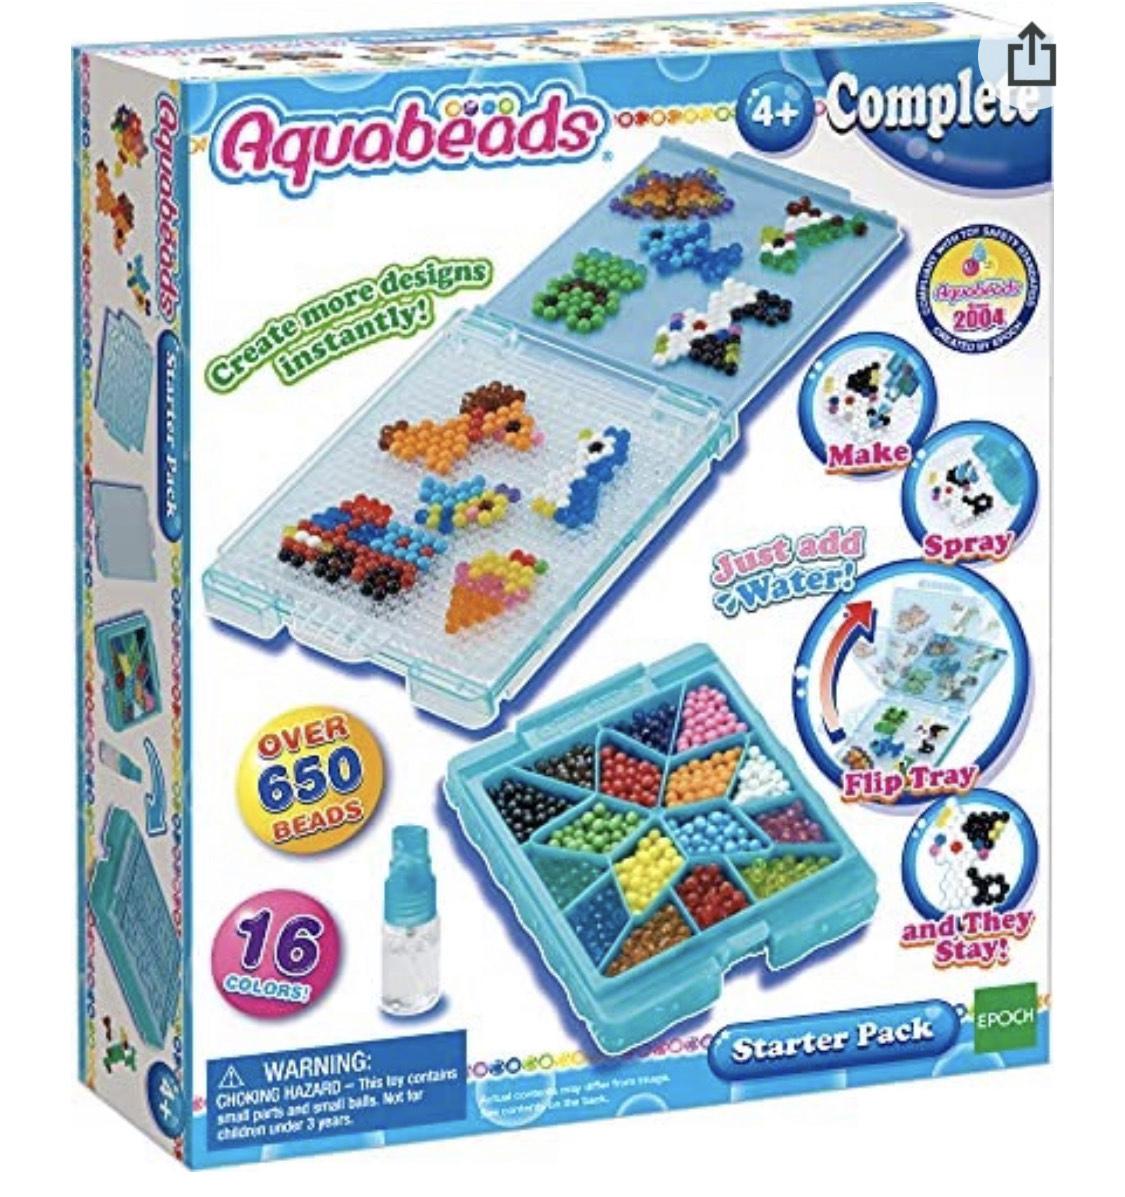 Aquabeads Starter pack £4.65 pr8me (+£4.49 nonPrime) at Amazon